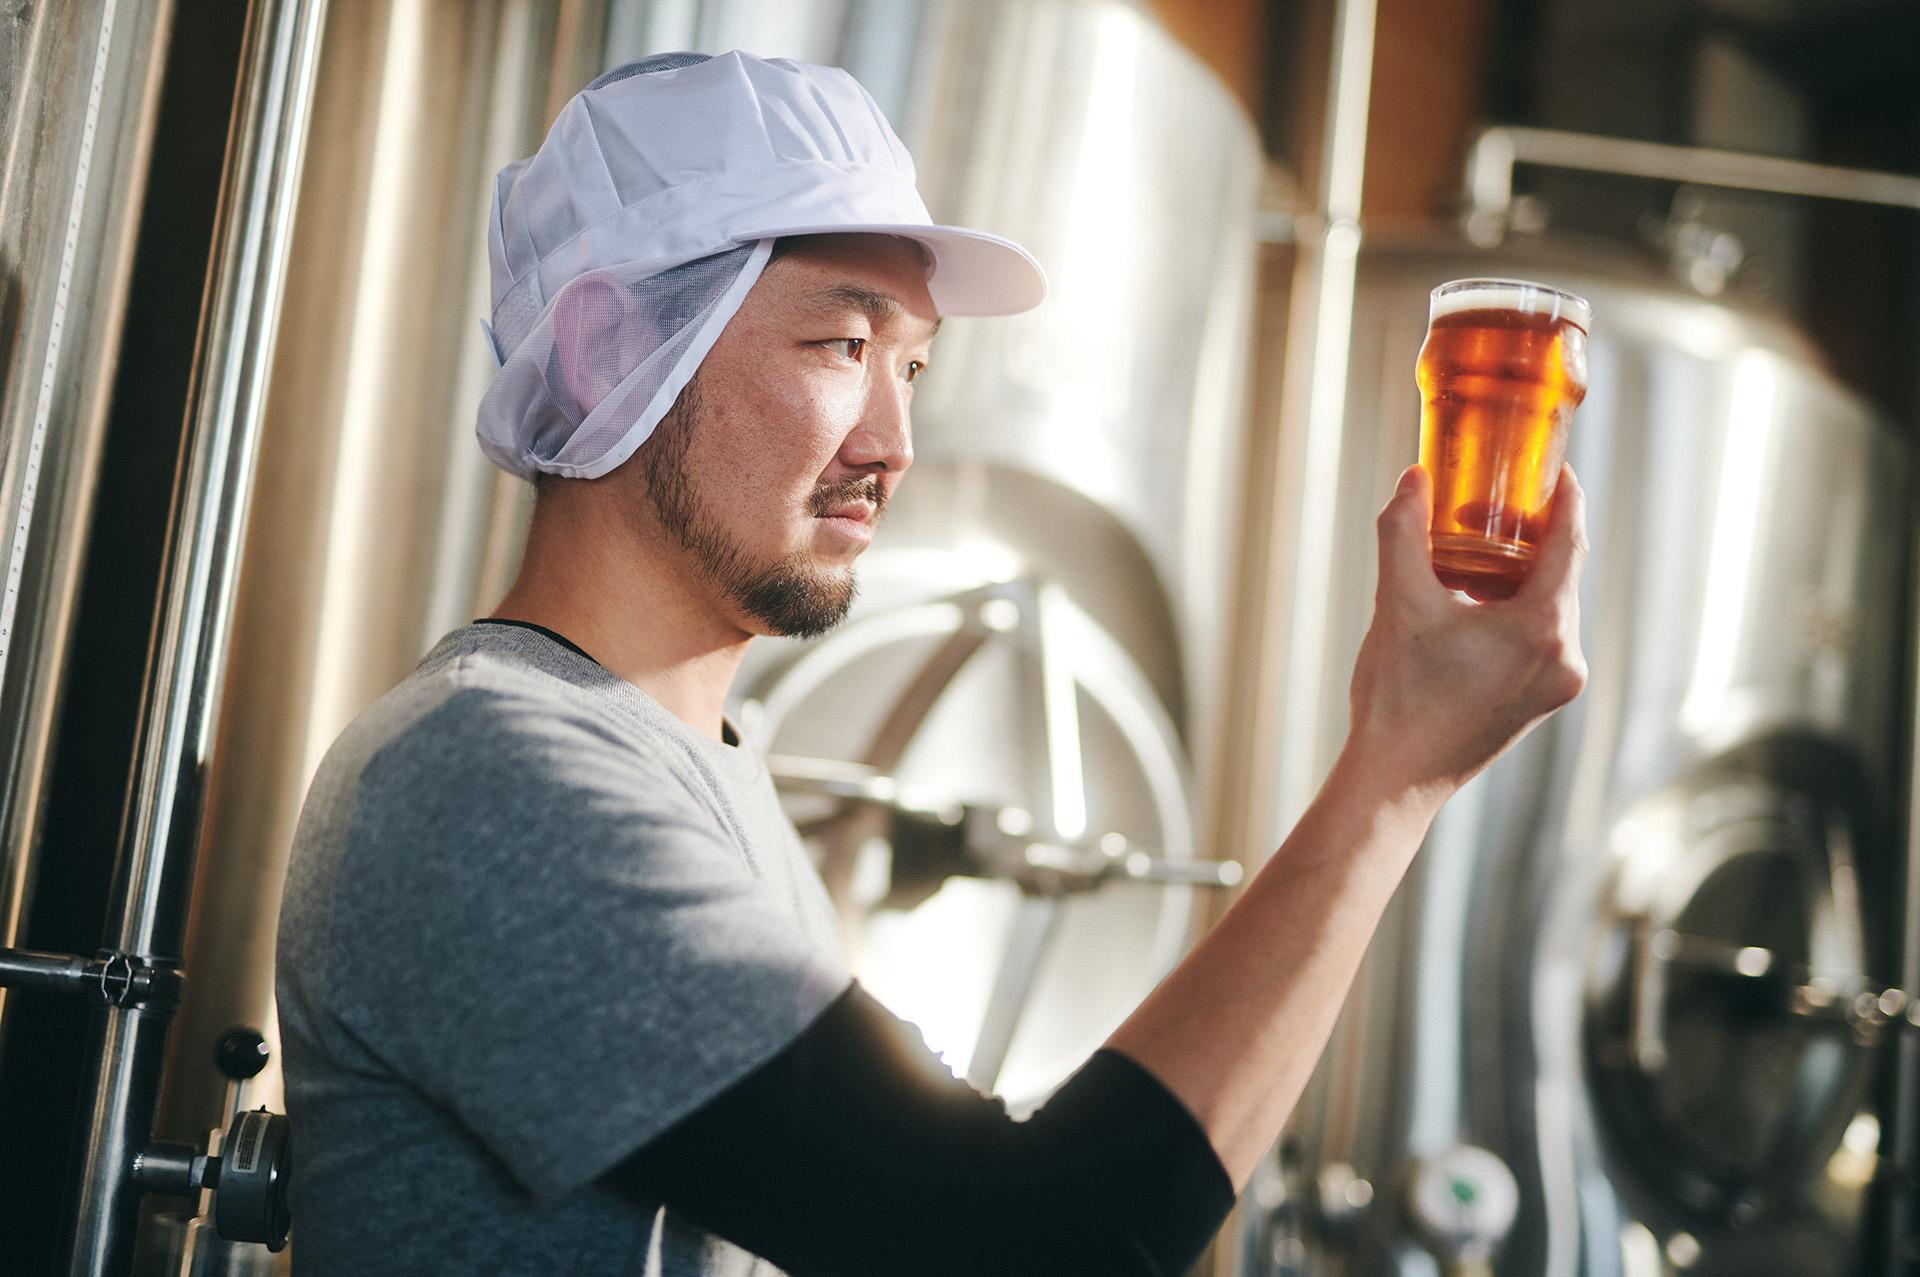 883247142f8c3f77df3e2590db0b27c9 【クラフトビール好き必見】よなよなエールご担当者に聞く、アウトドア料理に合うビール7選!